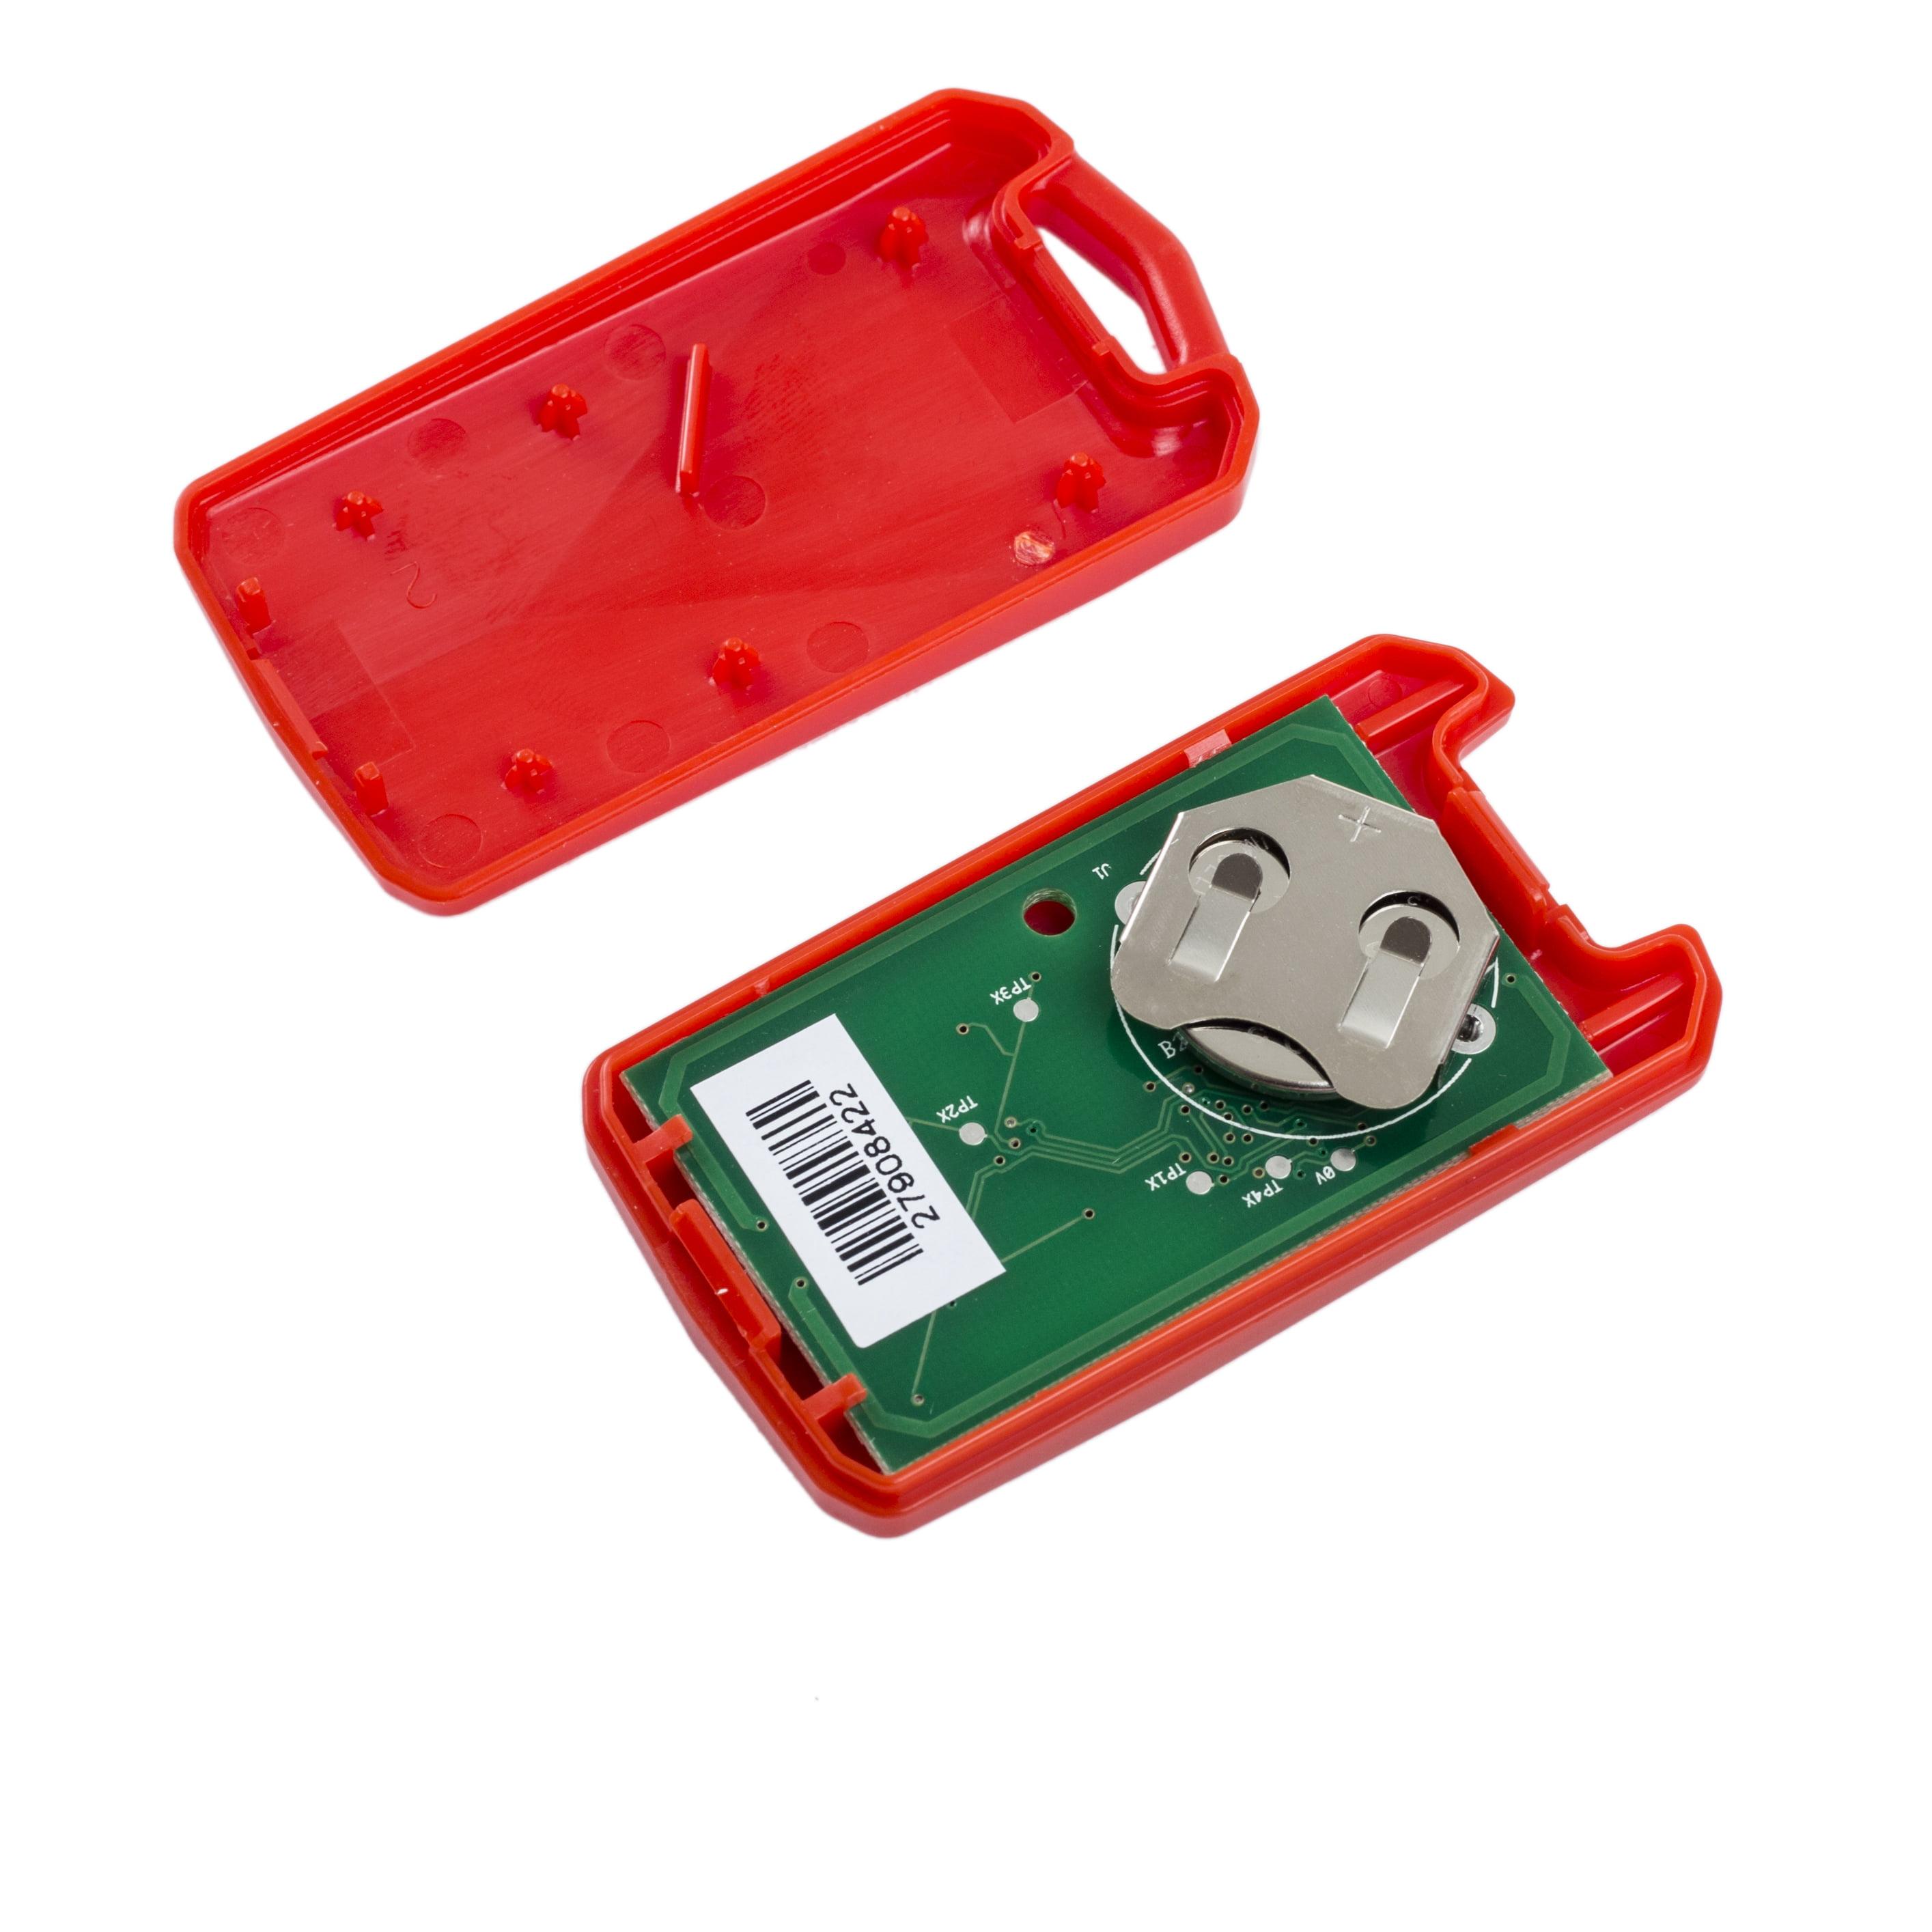 B&D TB5v2 Remote Control Red Transmitter TriTran